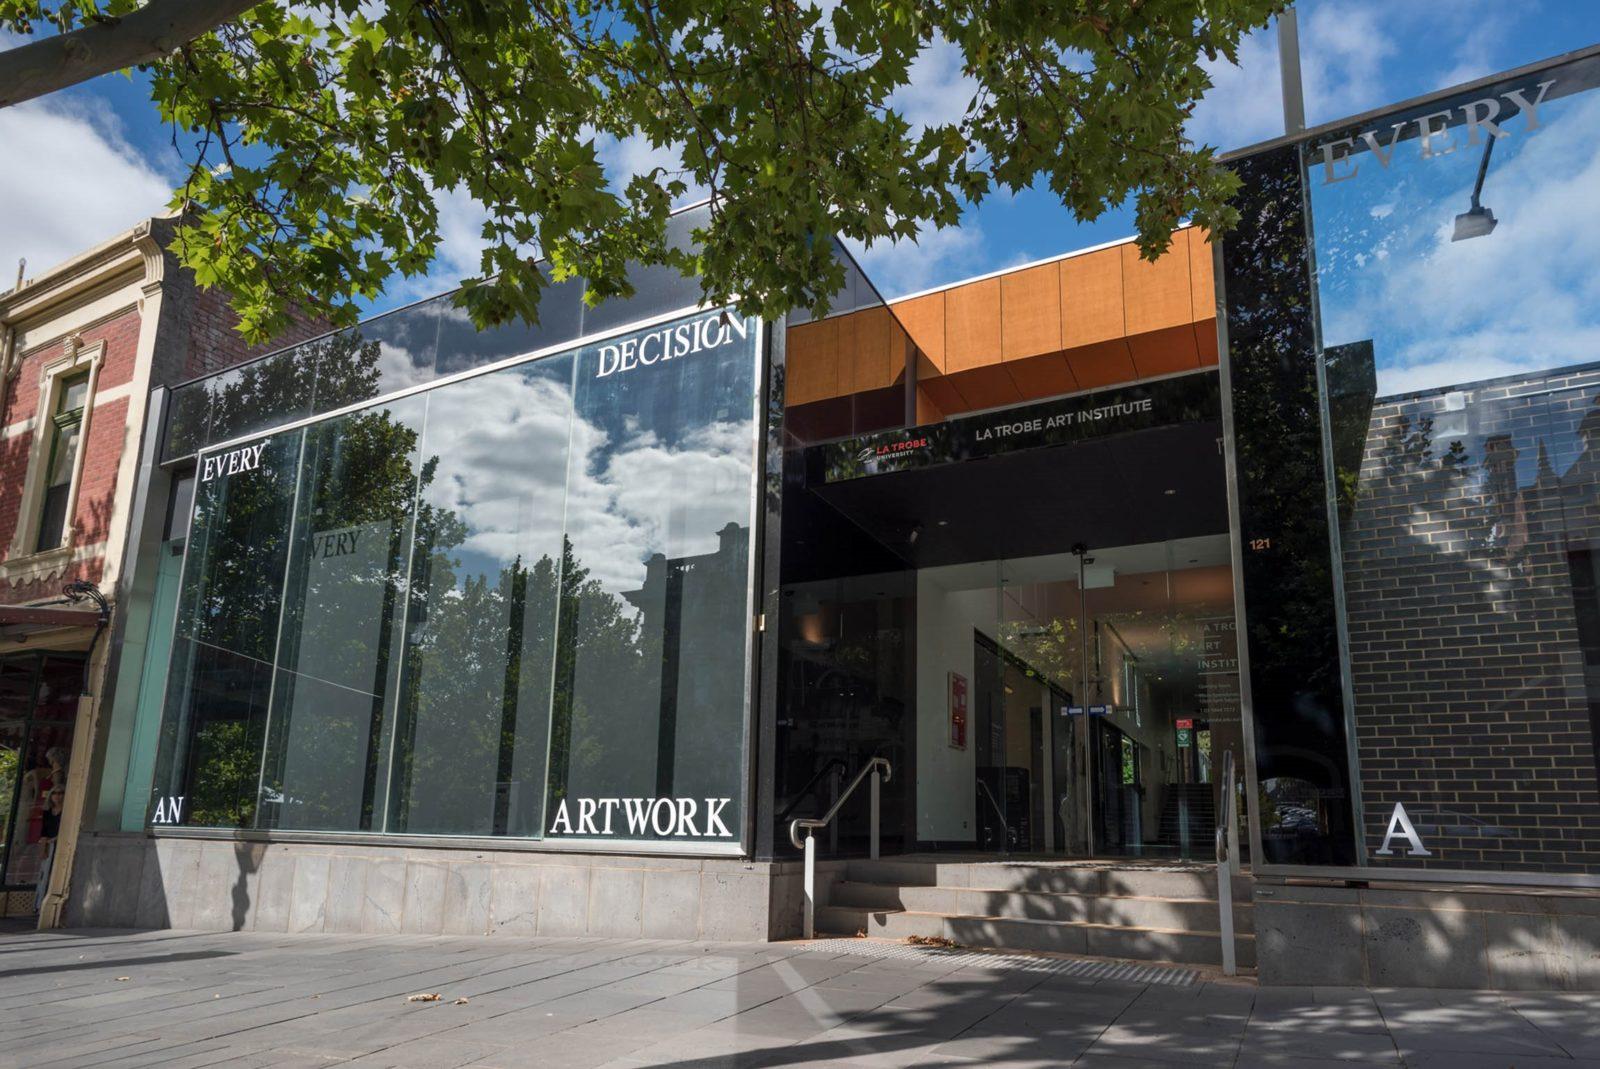 Facade of La Trobe Art Institute